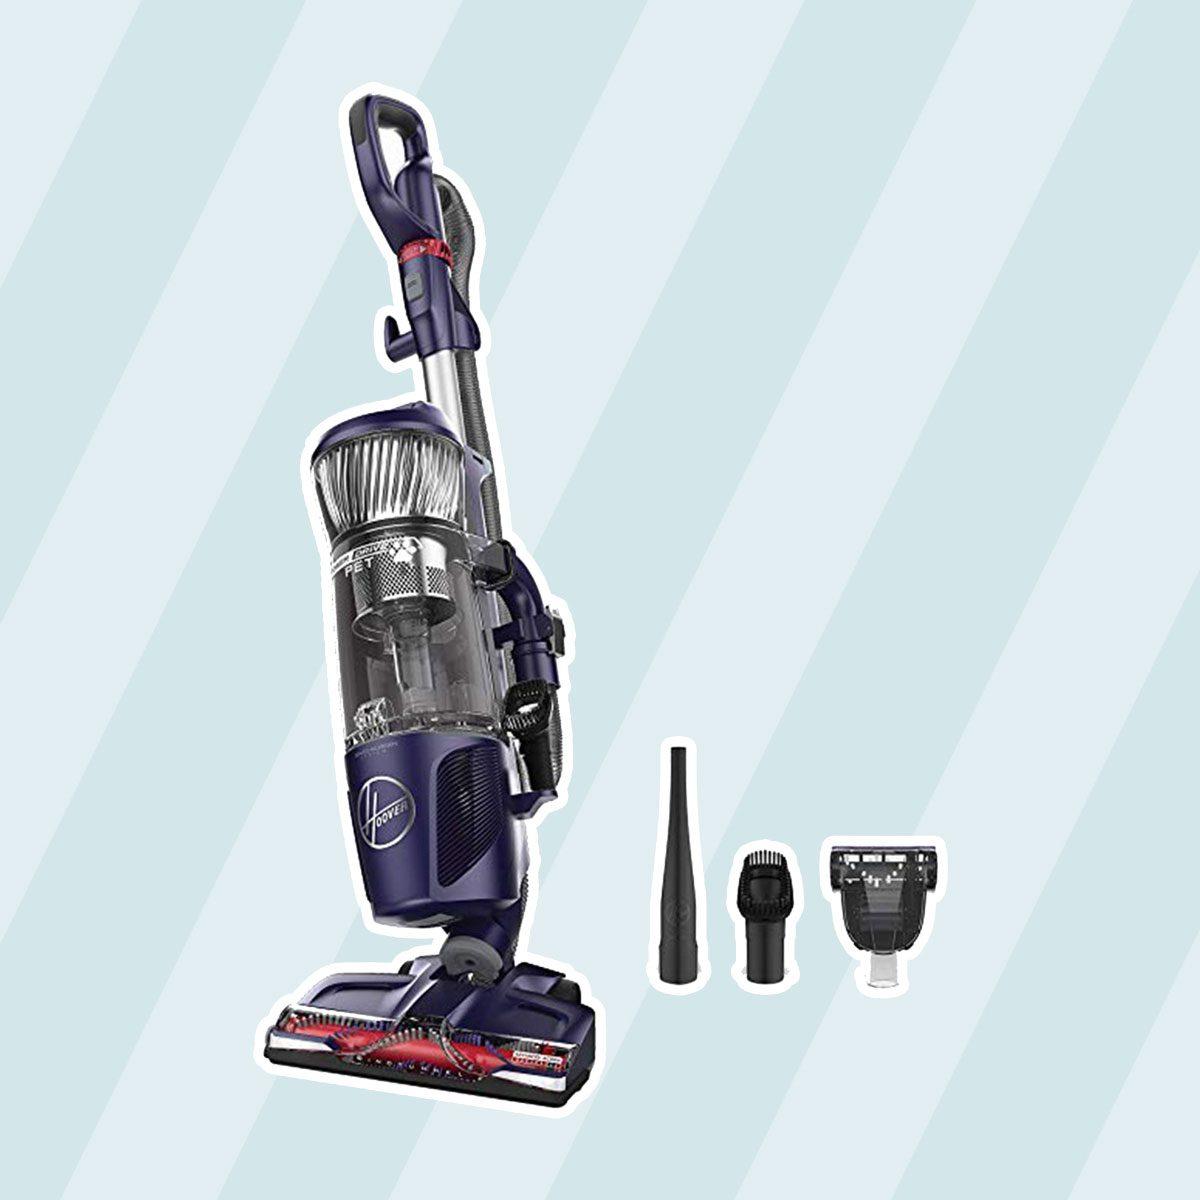 Hoover PowerDrive Pet Upright Vacuum